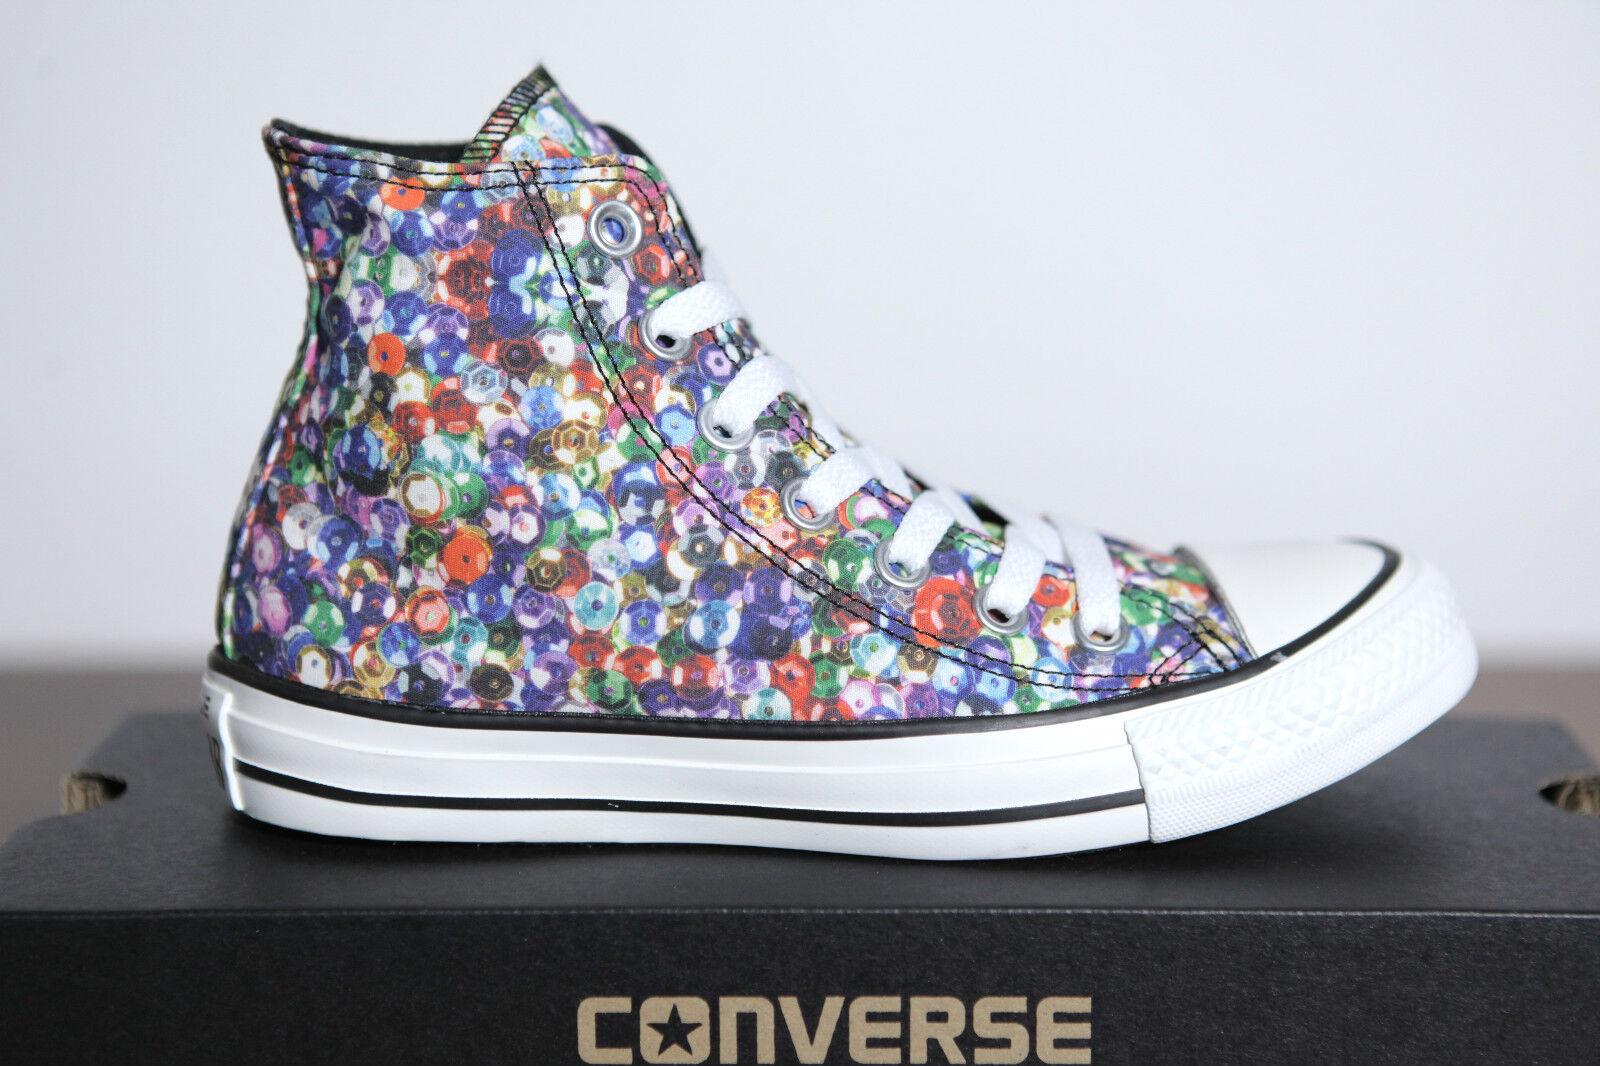 Neu All Star Hi Converse Chucks Hi Star Leinen+ Leder Damen Sneaker viele Farben Modelle 79b9ef